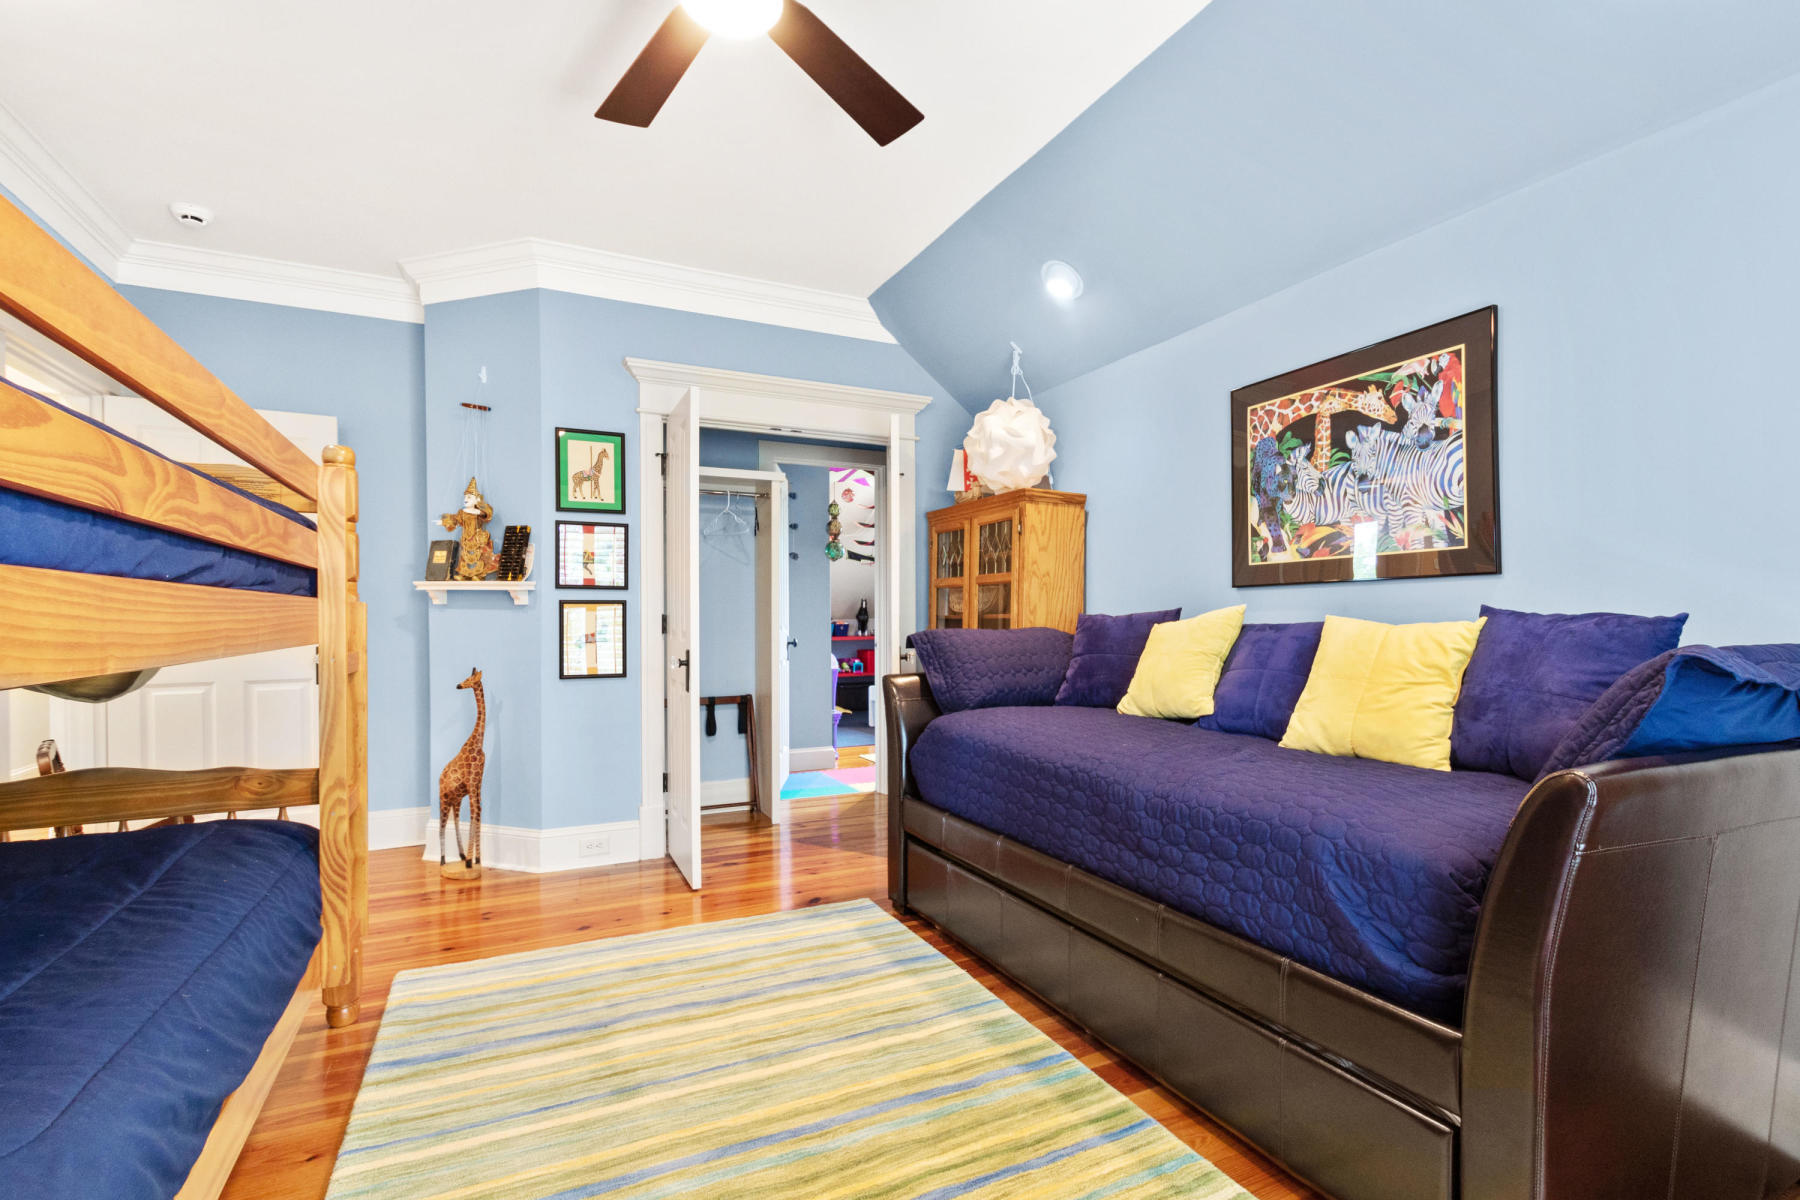 Broughton Hall Homes For Sale - 2058 Lakeshore, Pinopolis, SC - 26